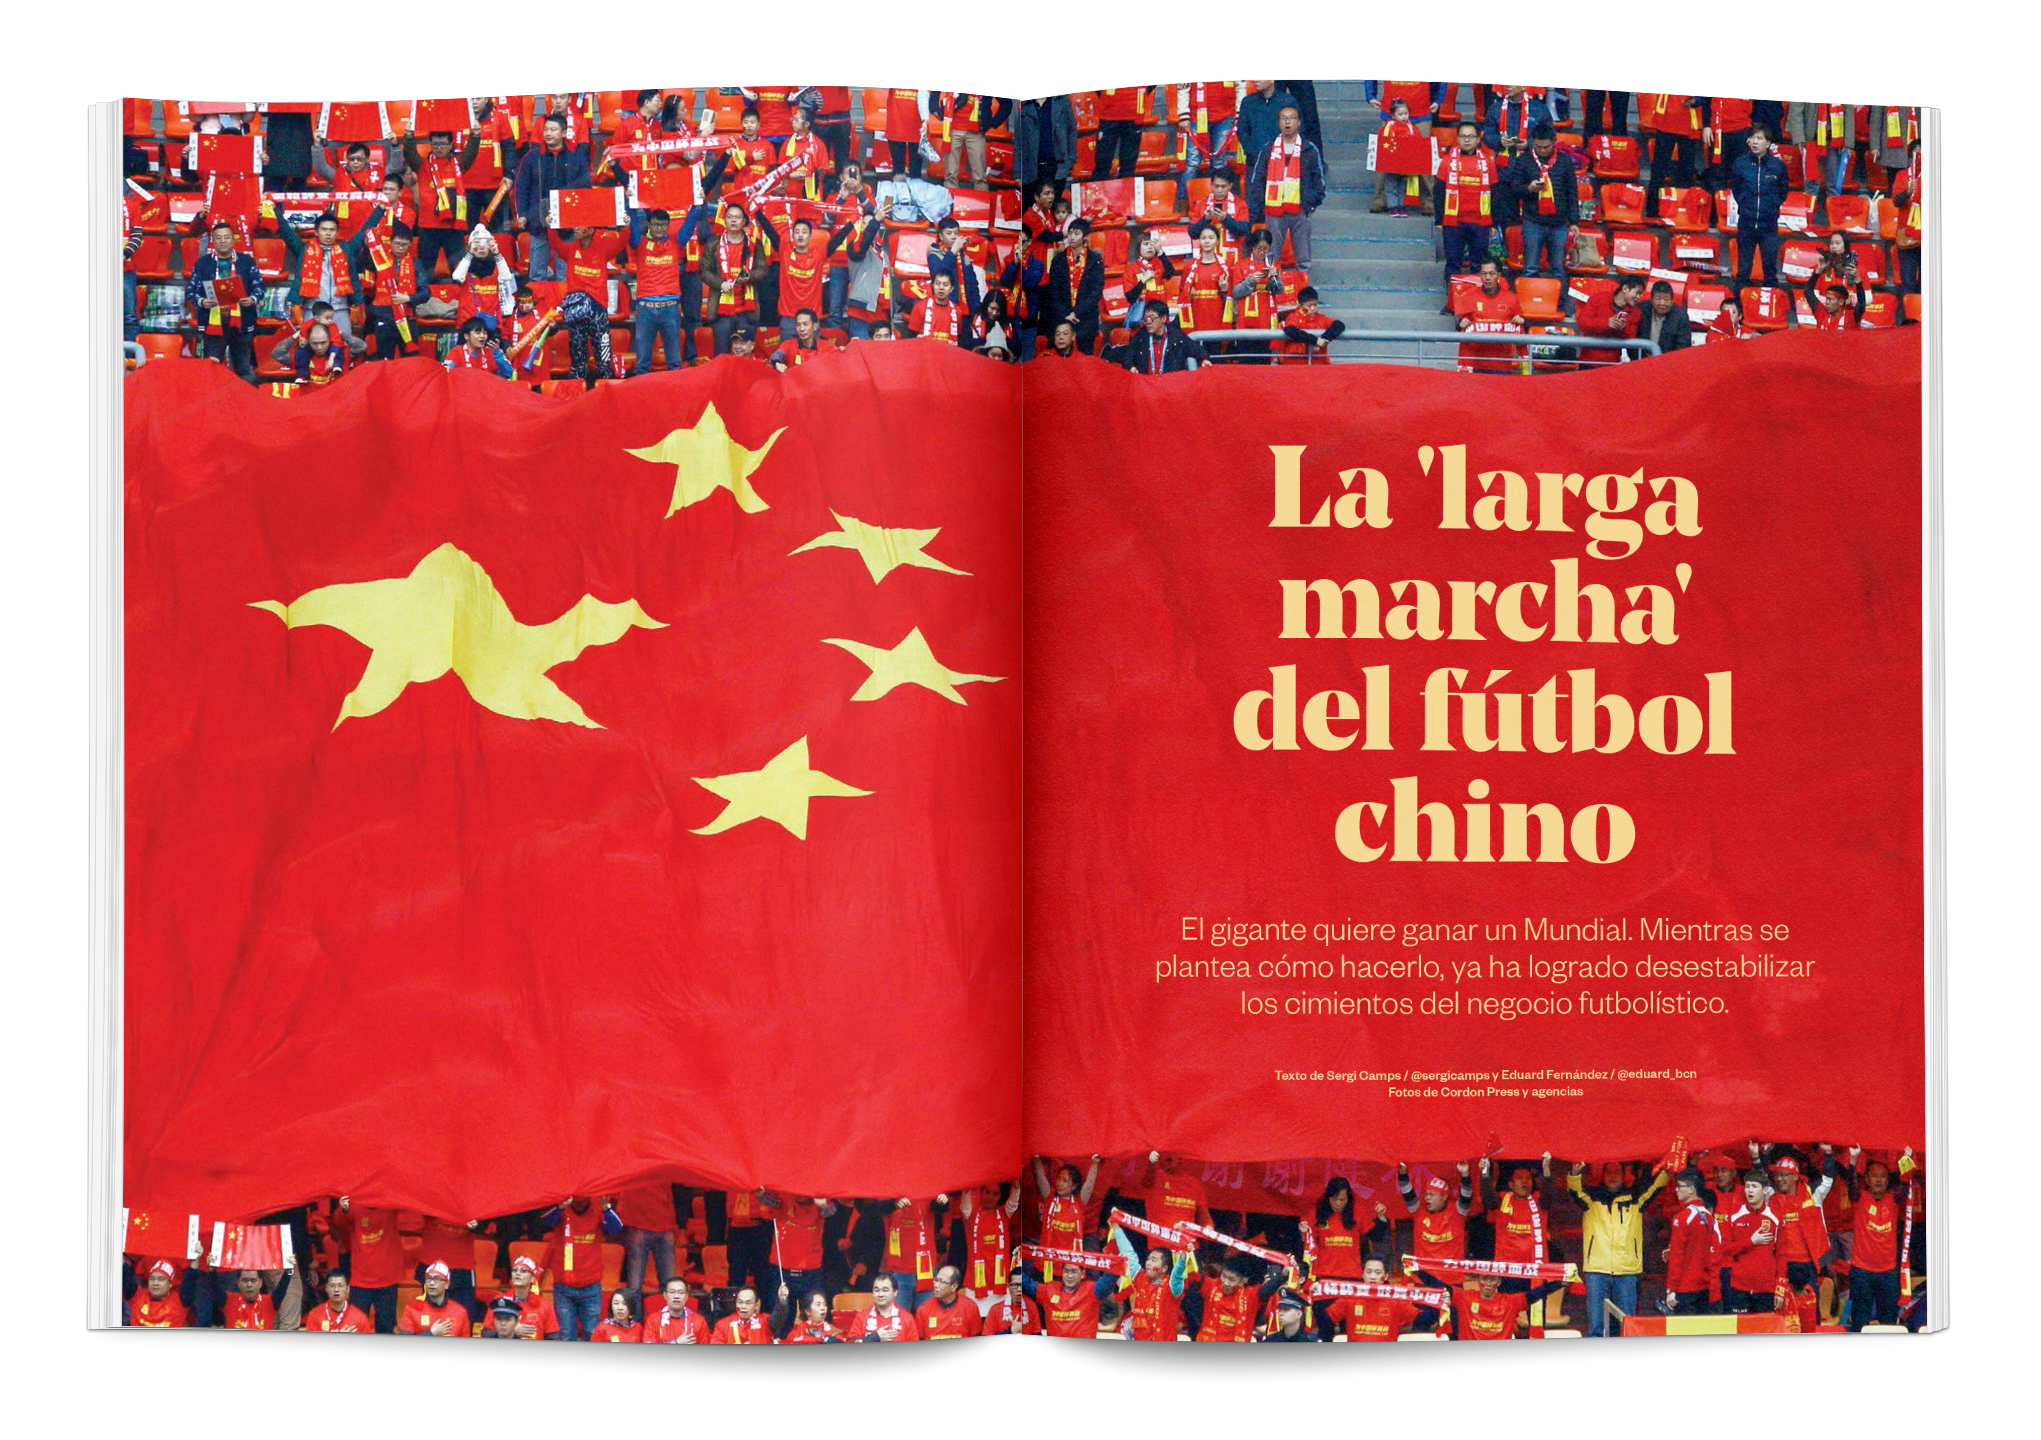 La larga marcha del fútbol chino